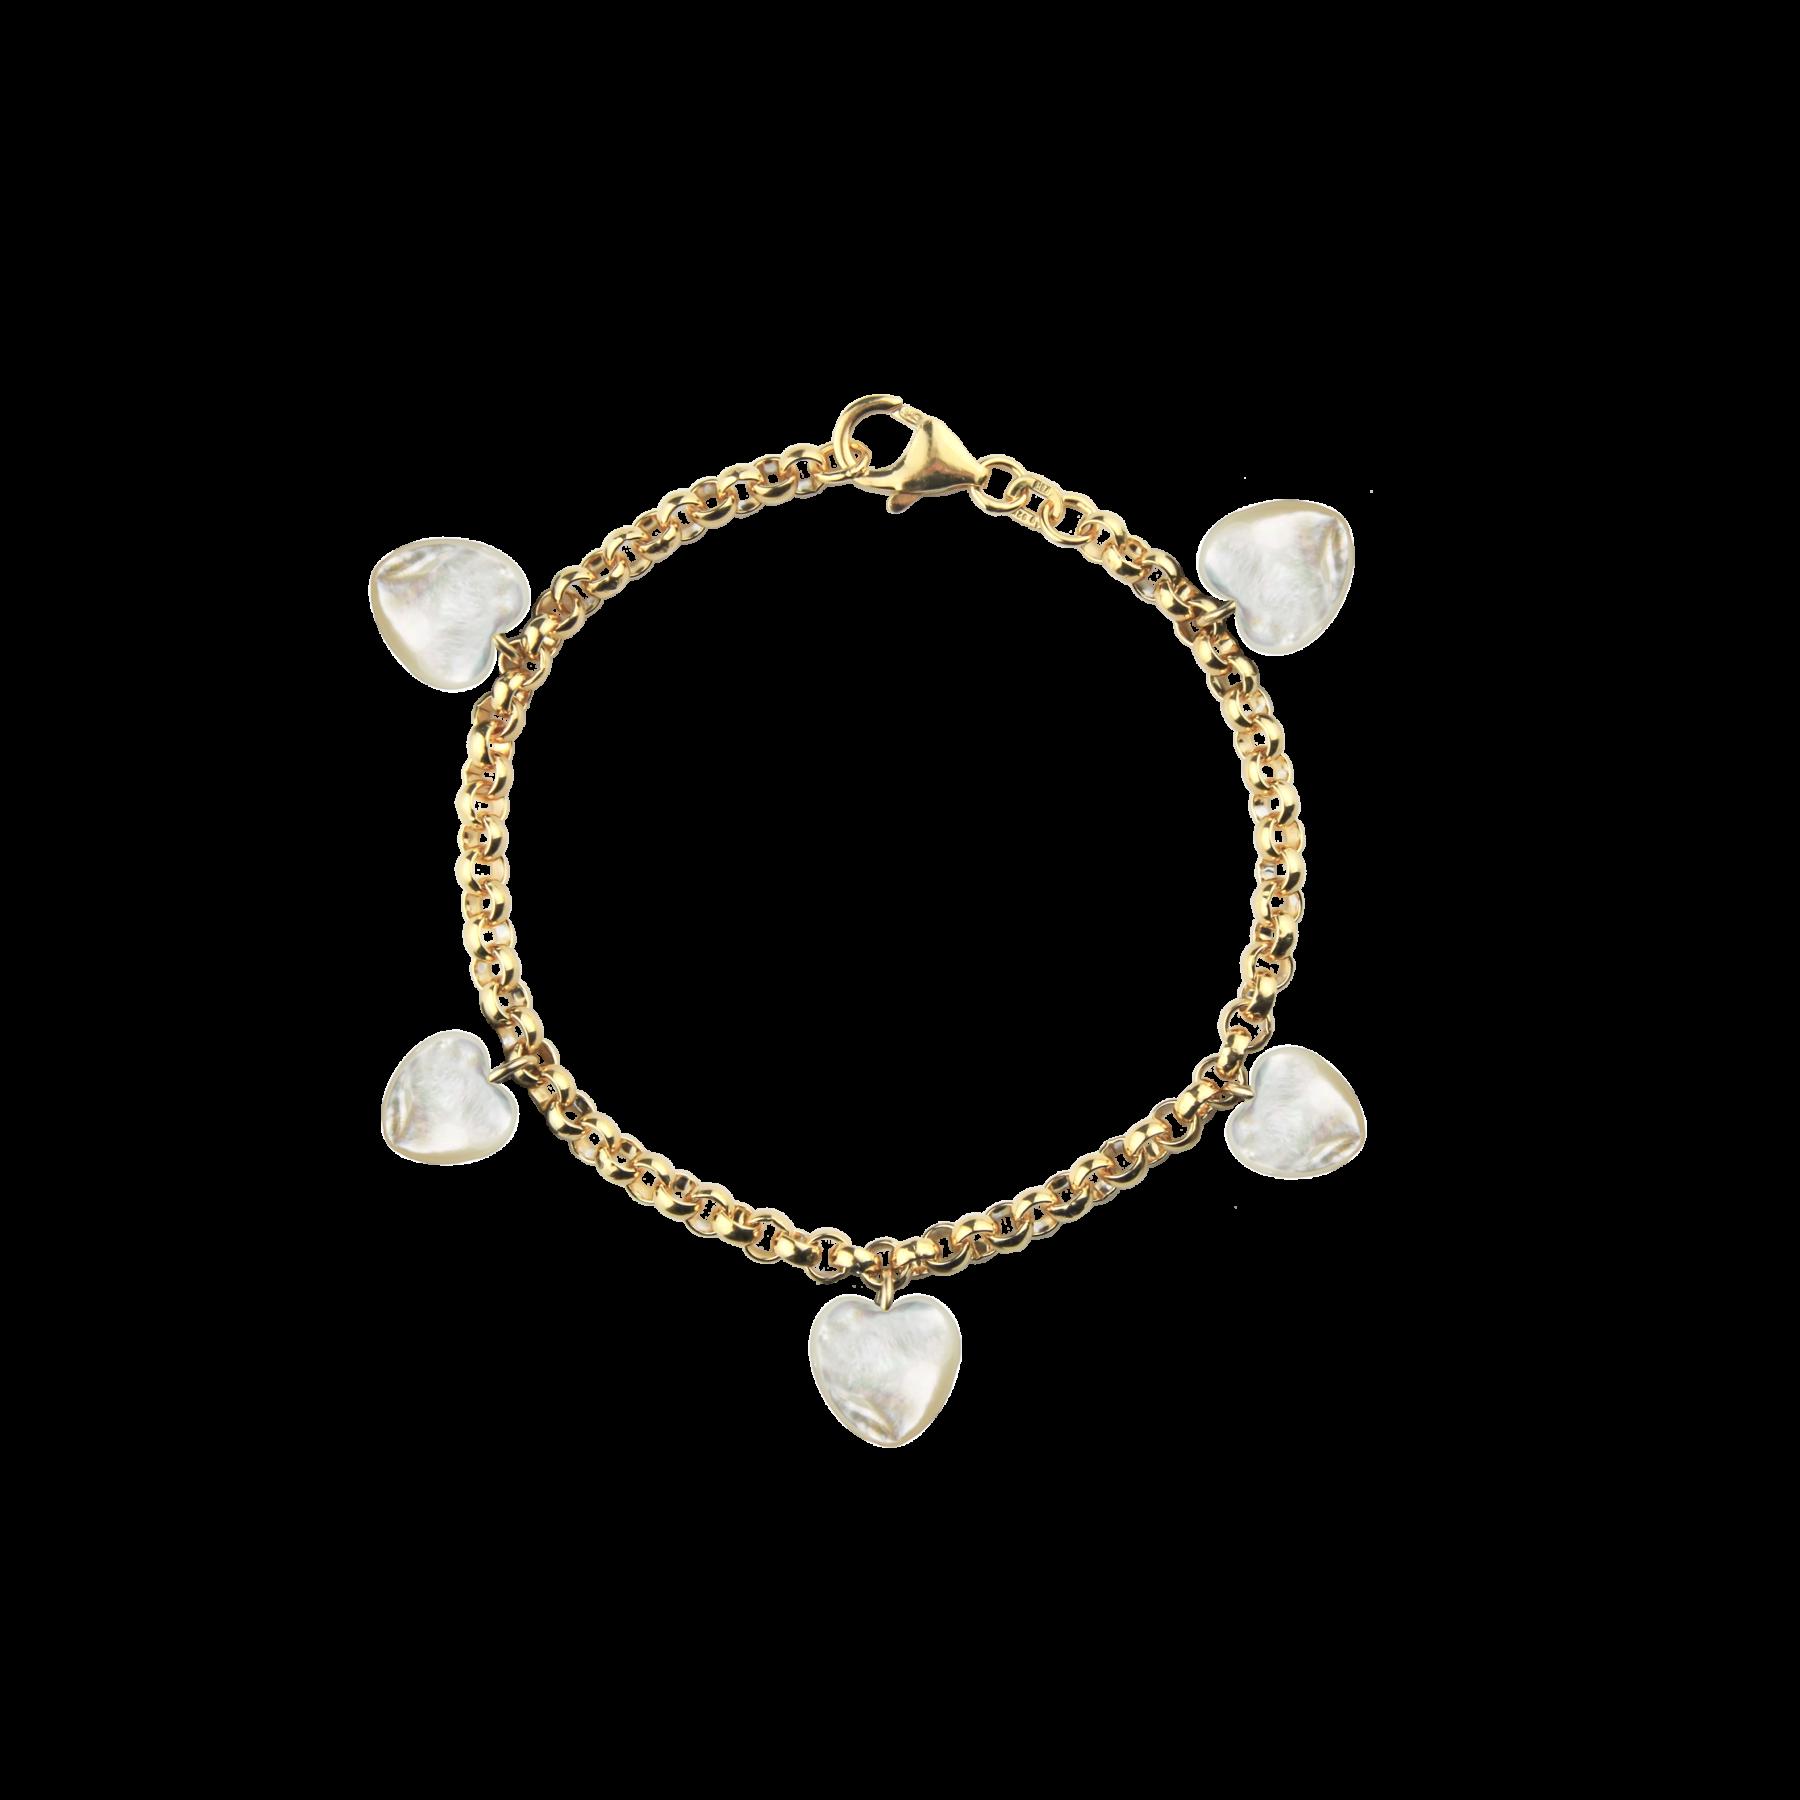 Bracelet---White-Hearts